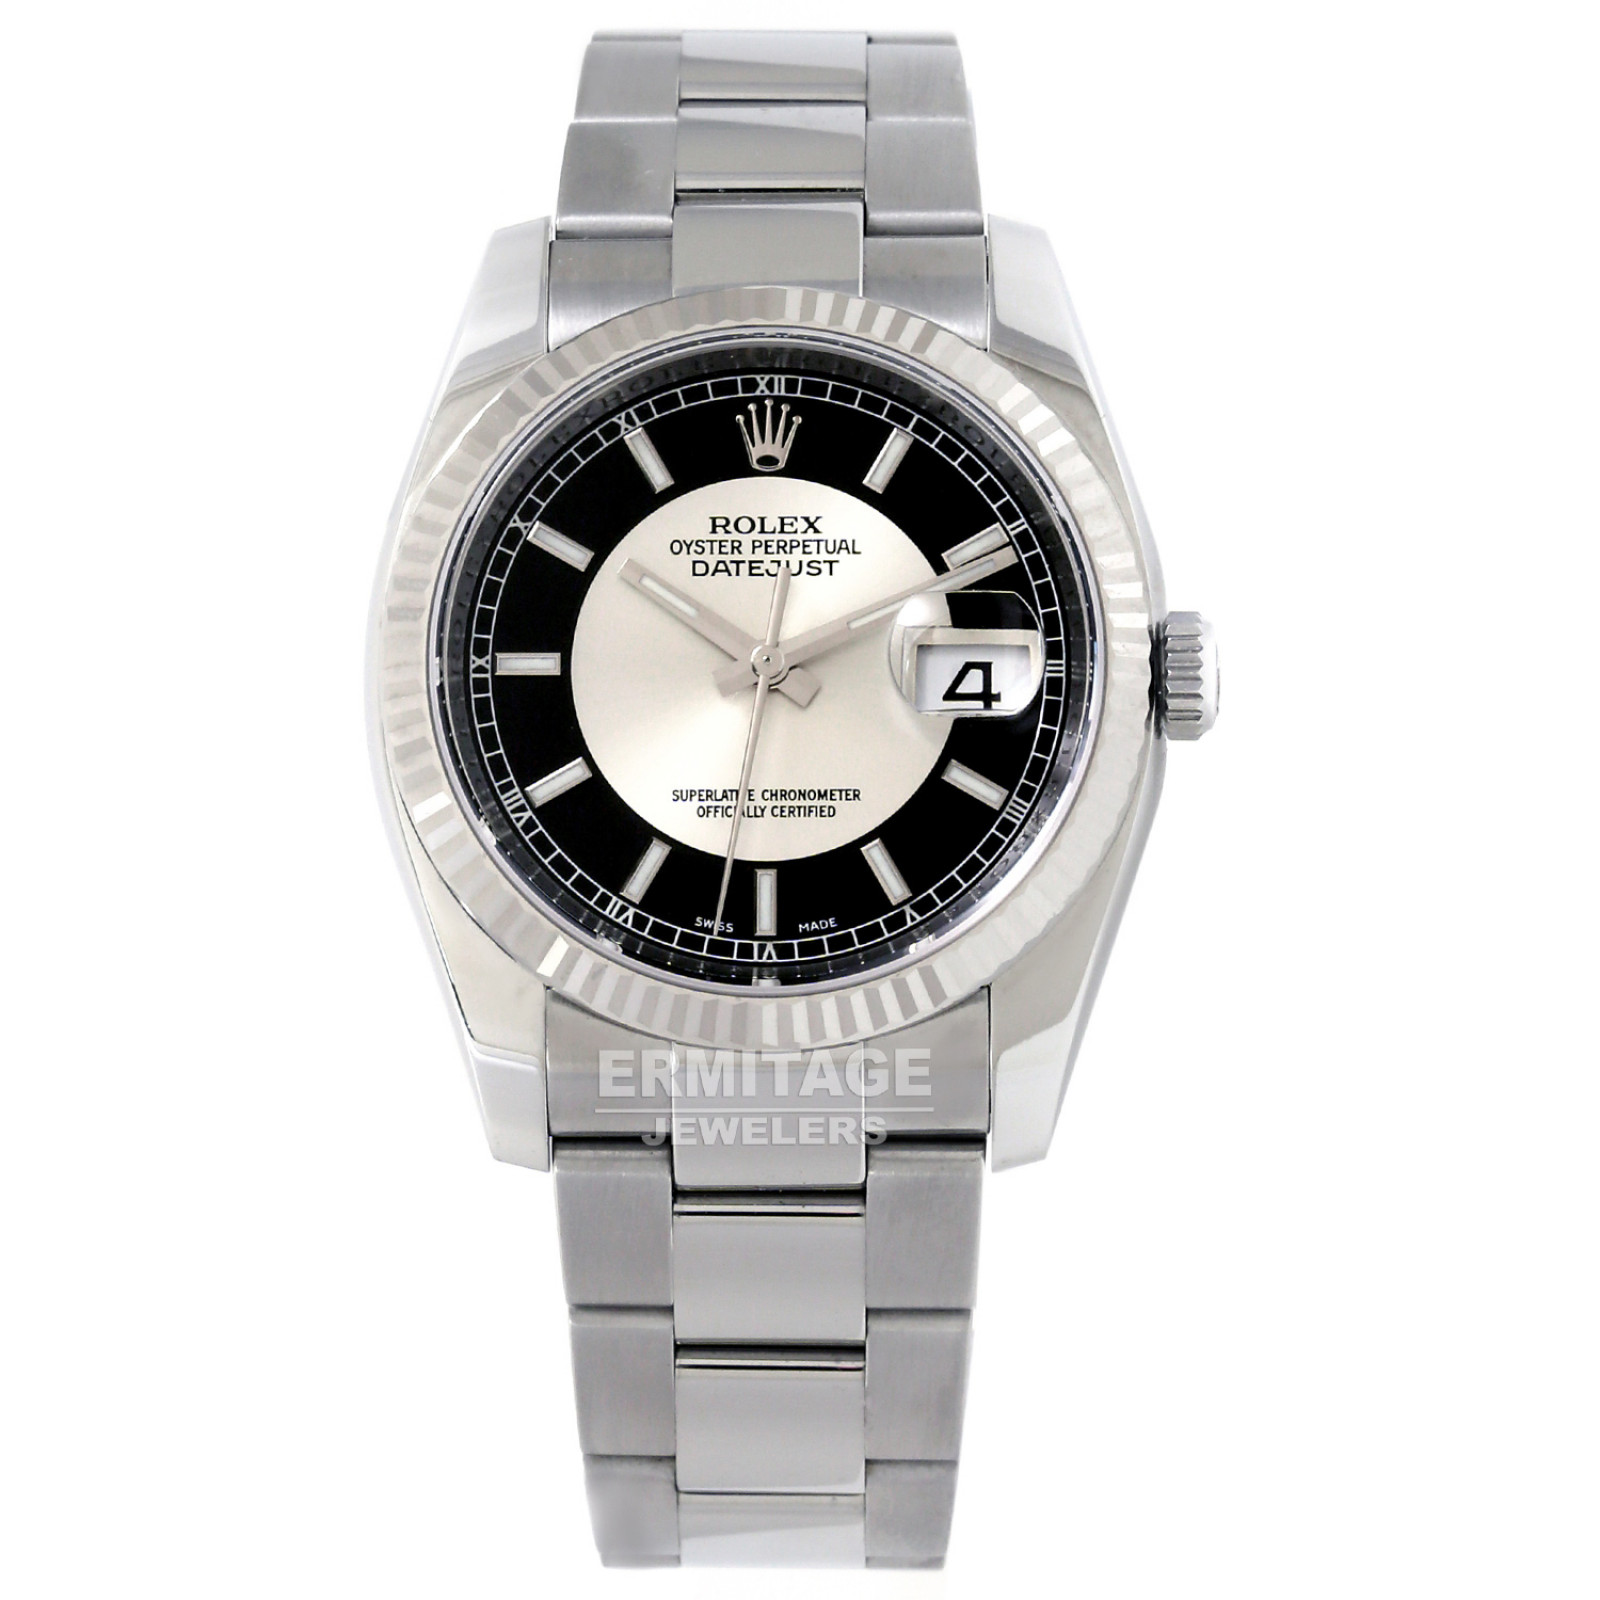 Rolex Datejust 116234 Unworn